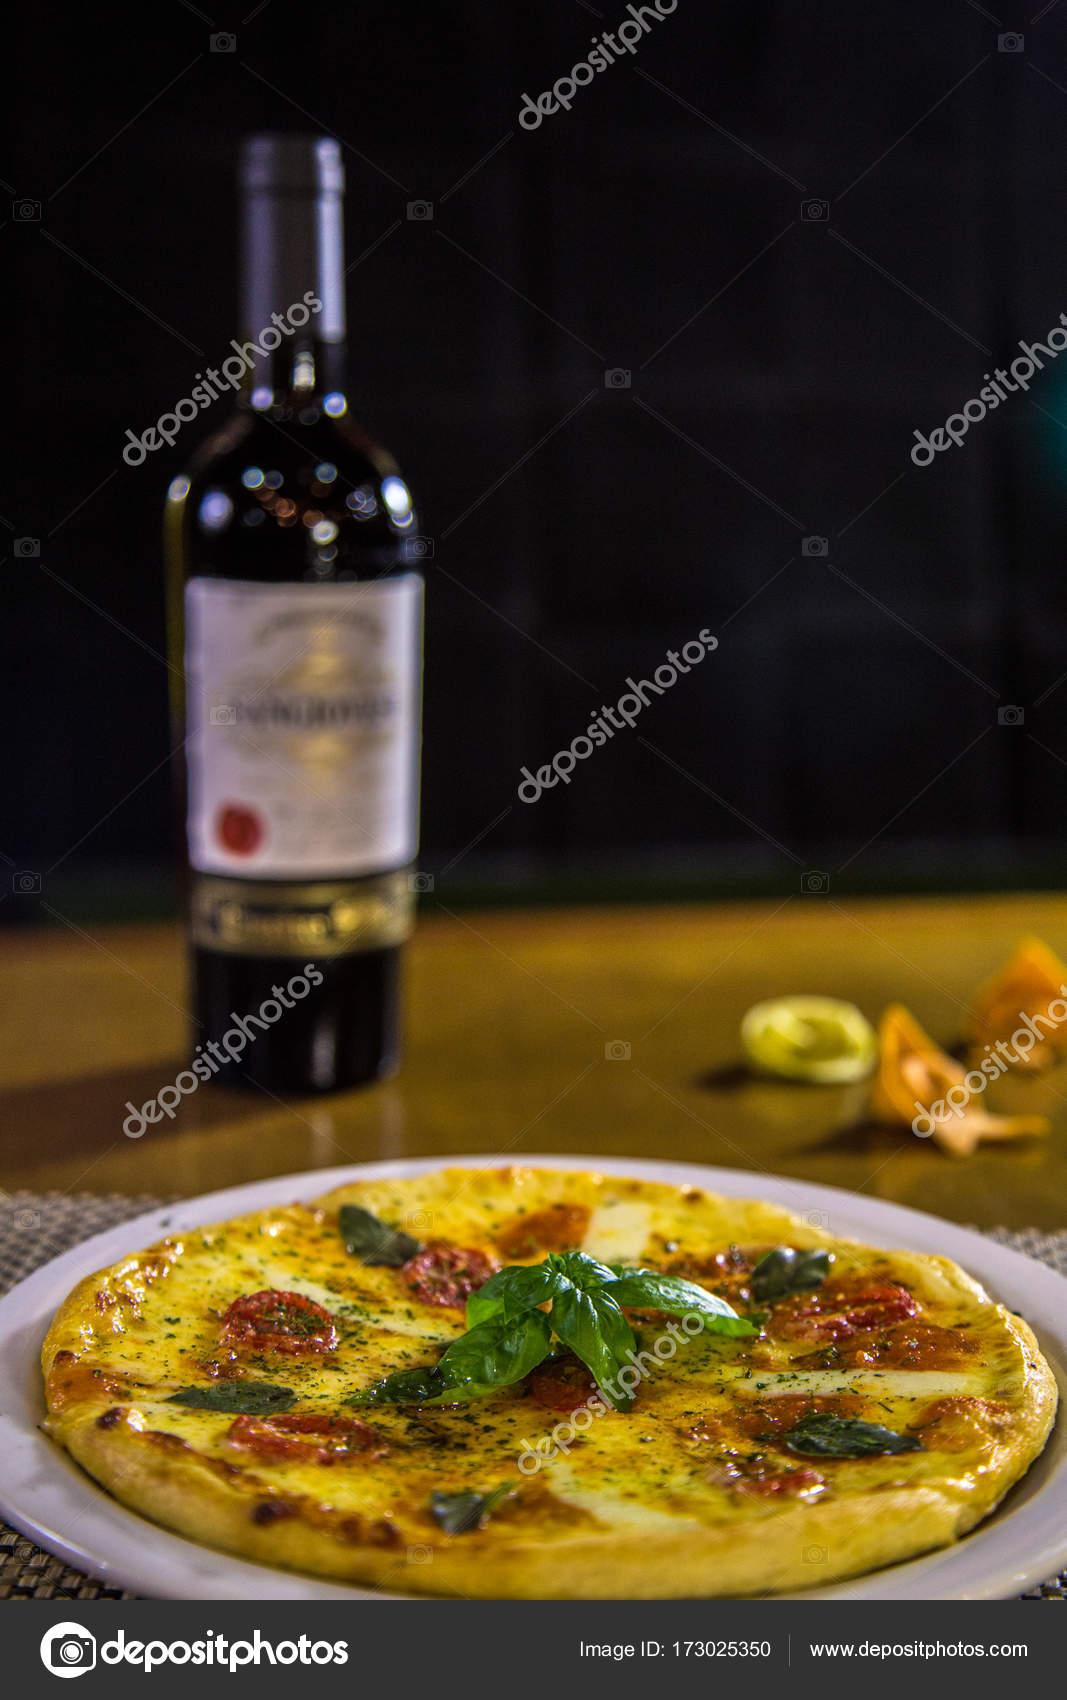 Cozinha comida brasileira de pizza stock photo for Stock cuisine saint priest